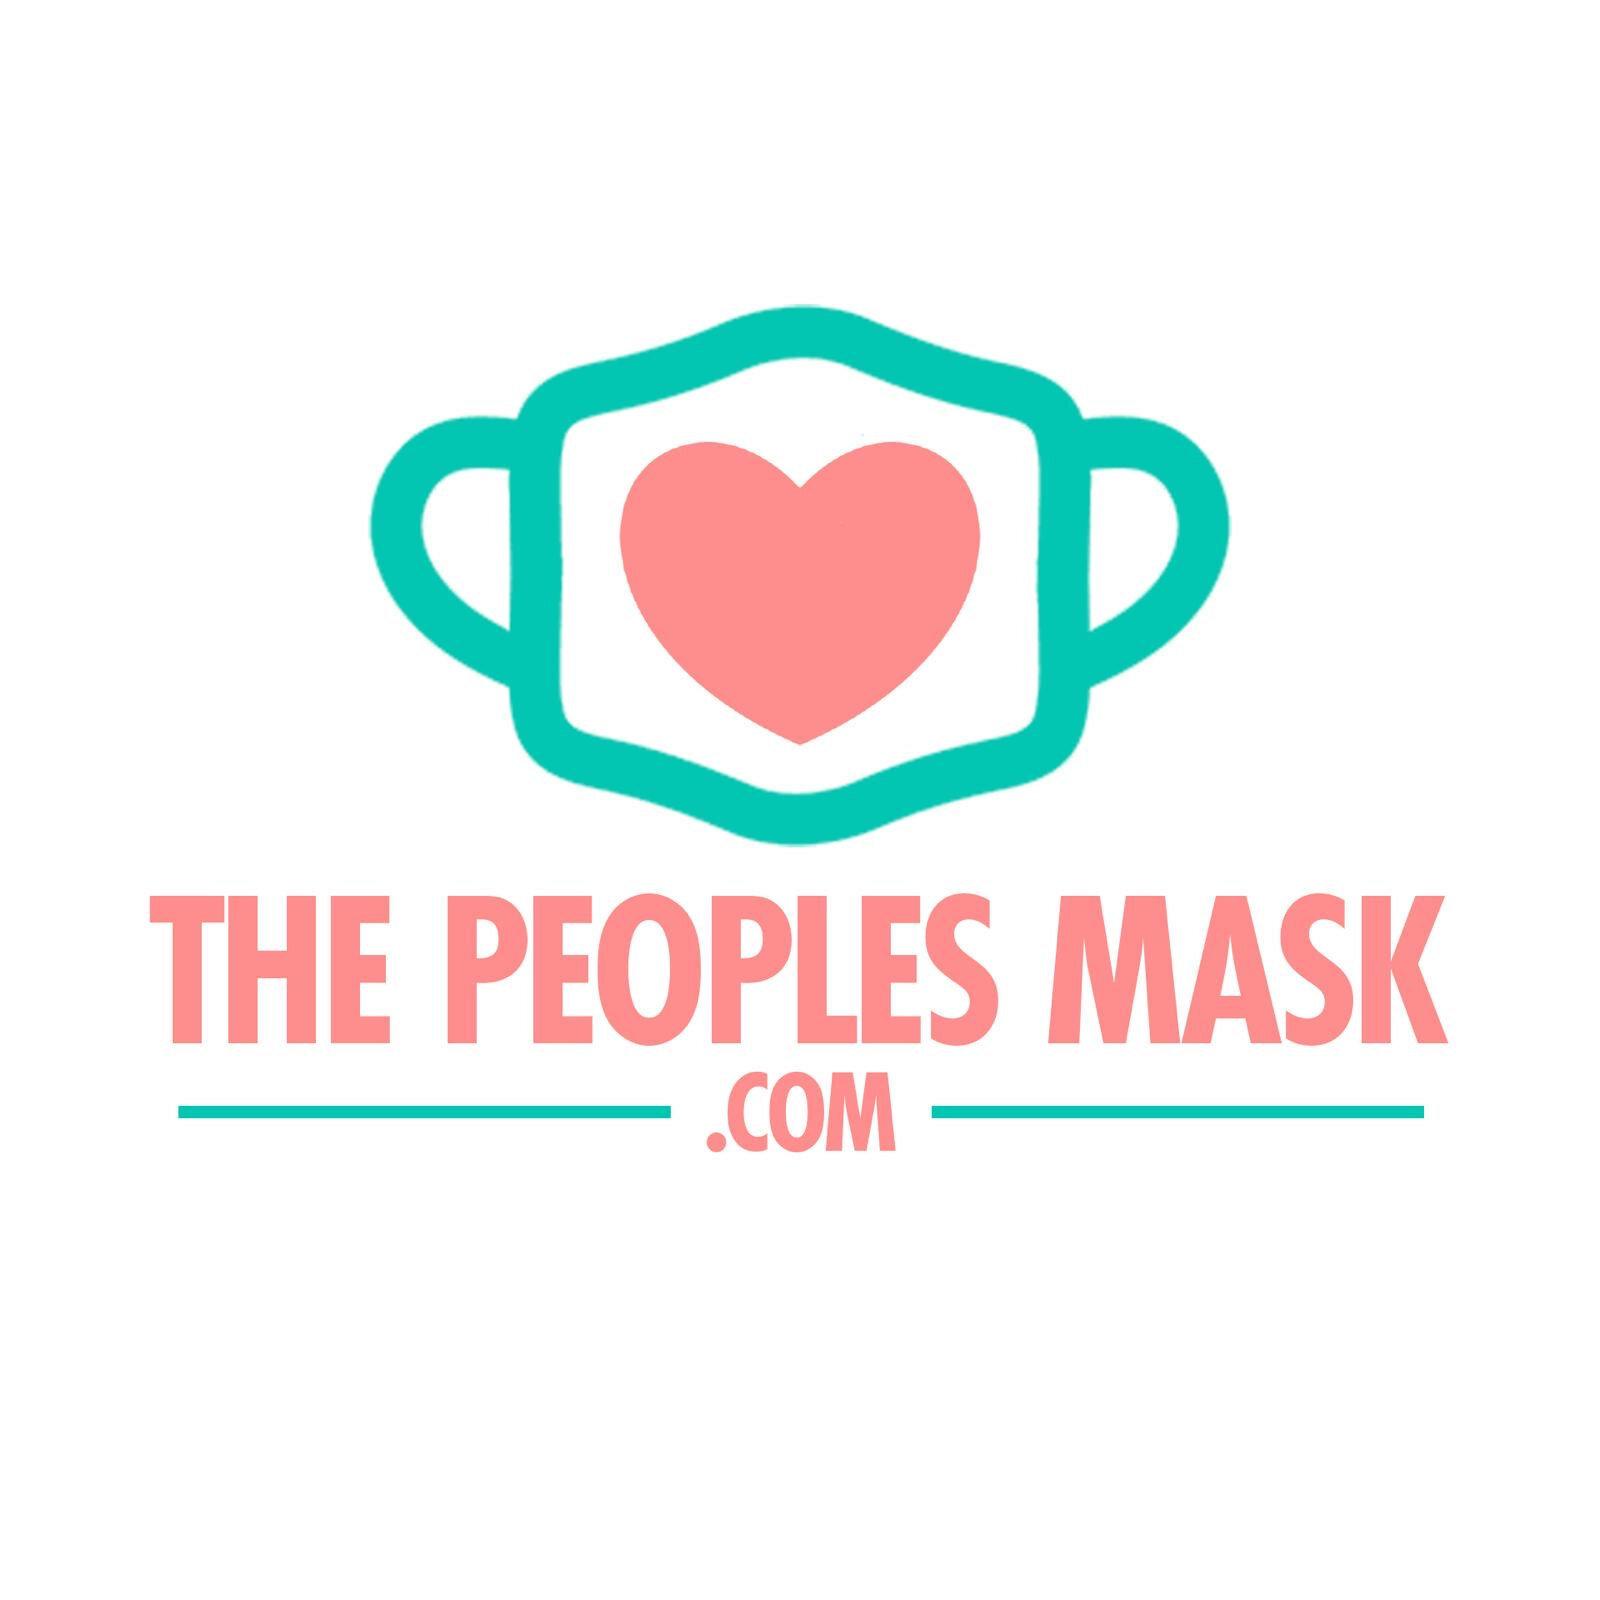 The People's Mask - Edmonton, AB(780) 306-5101info@thepeoplesmask.com